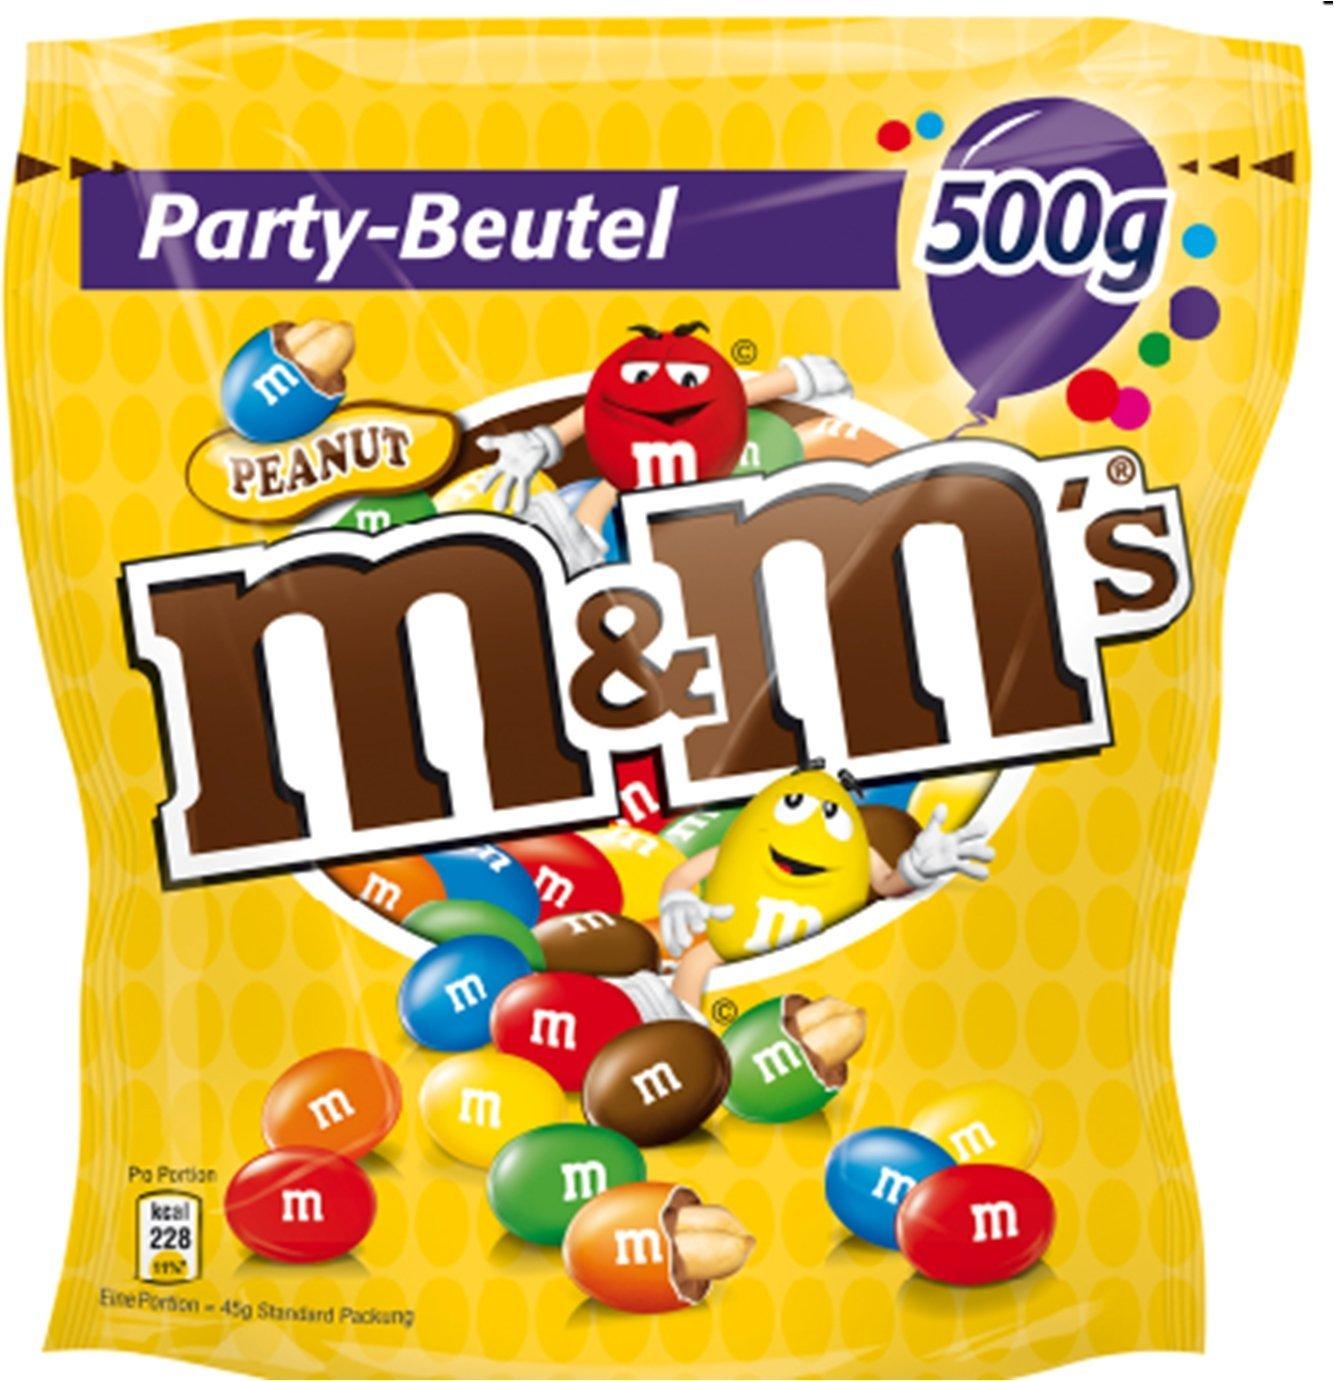 4x 500g Beutel M&M's Peanut (2 KG) ab 18,47€